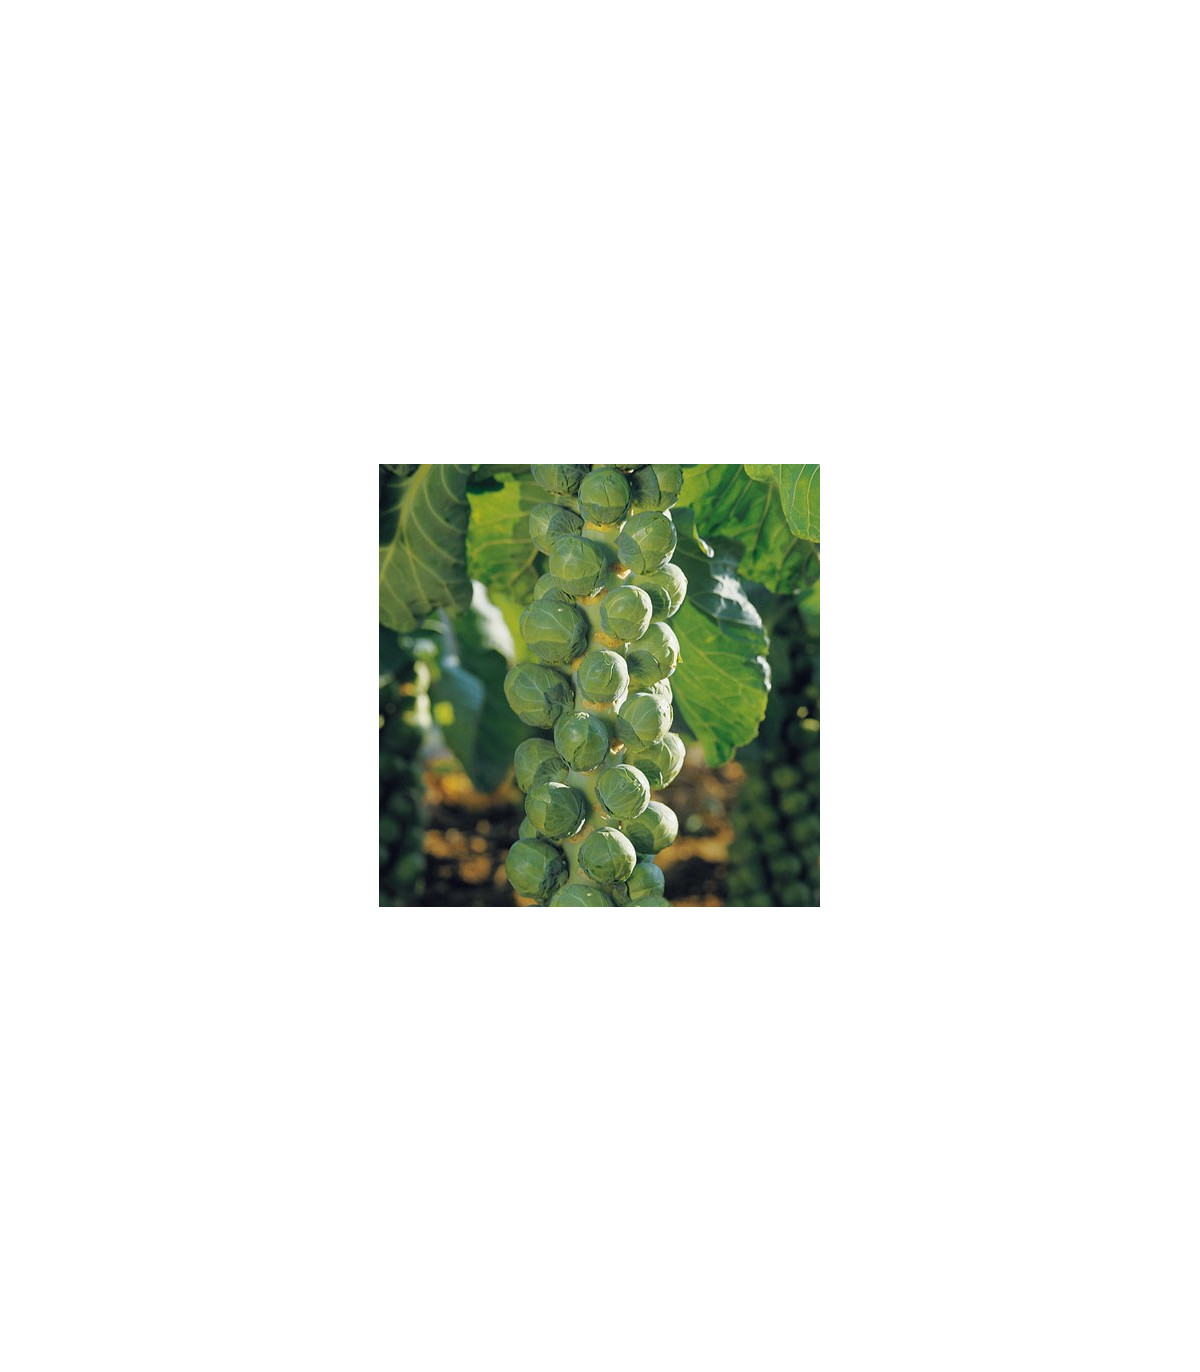 Kel ružičkový Hilds ideal - Brassica oleracea - semená kelu - semiačka - 0,5 gr